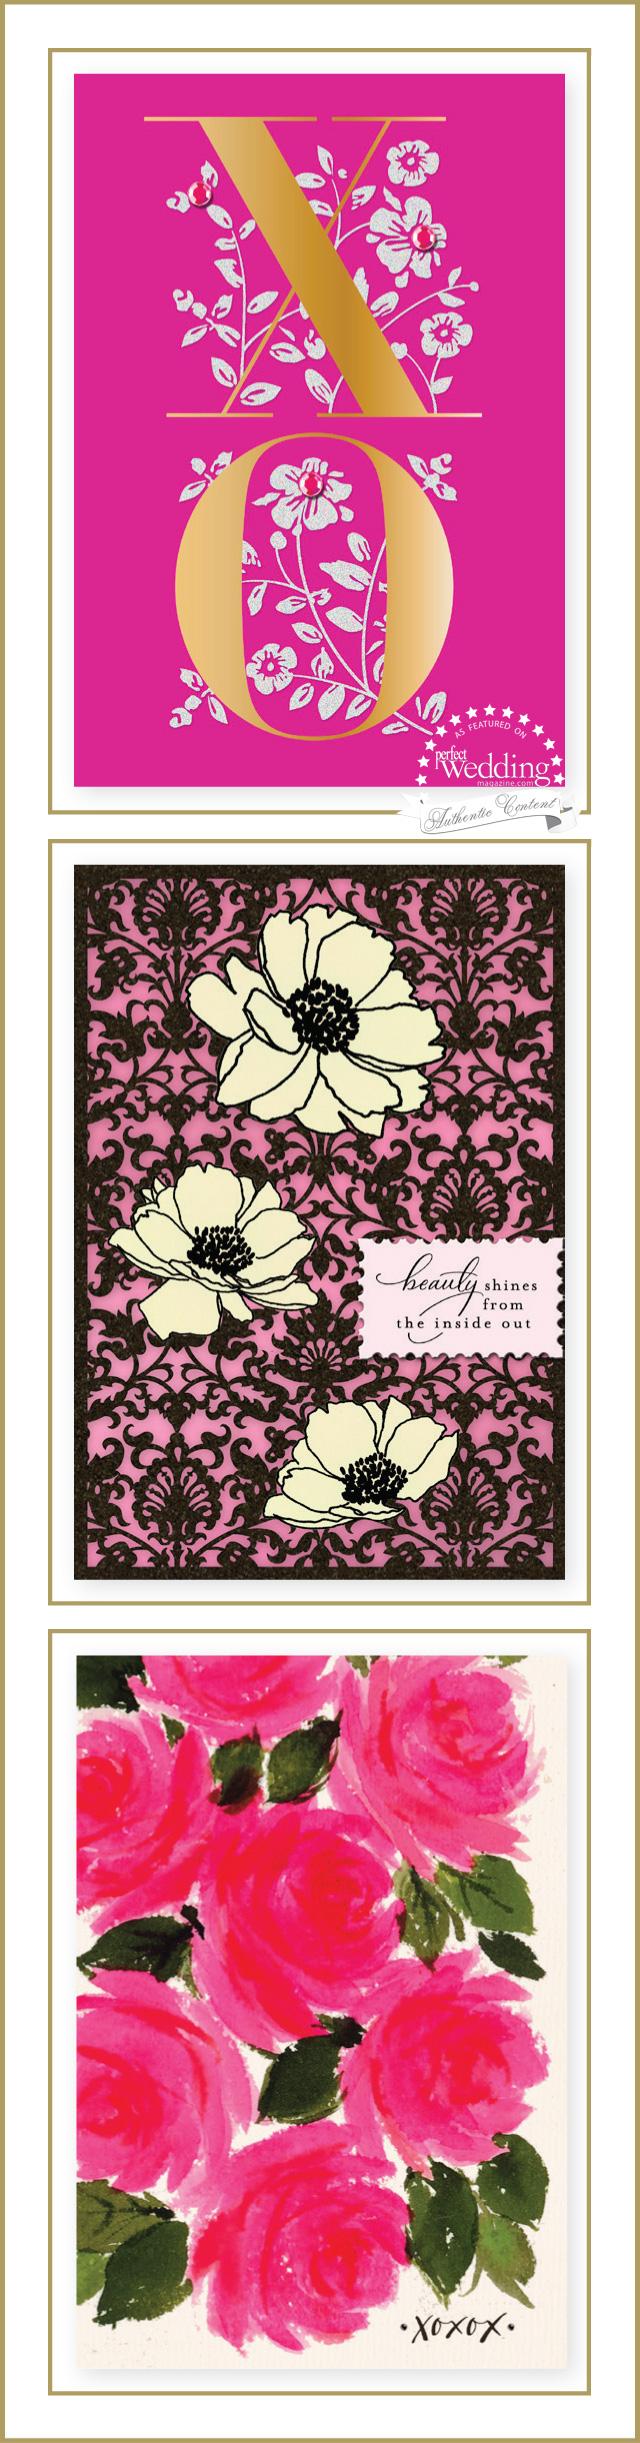 Sarah Jessica Parker Stationery, Hallmark, Perfect Wedding Magazine, Wedding Stationery